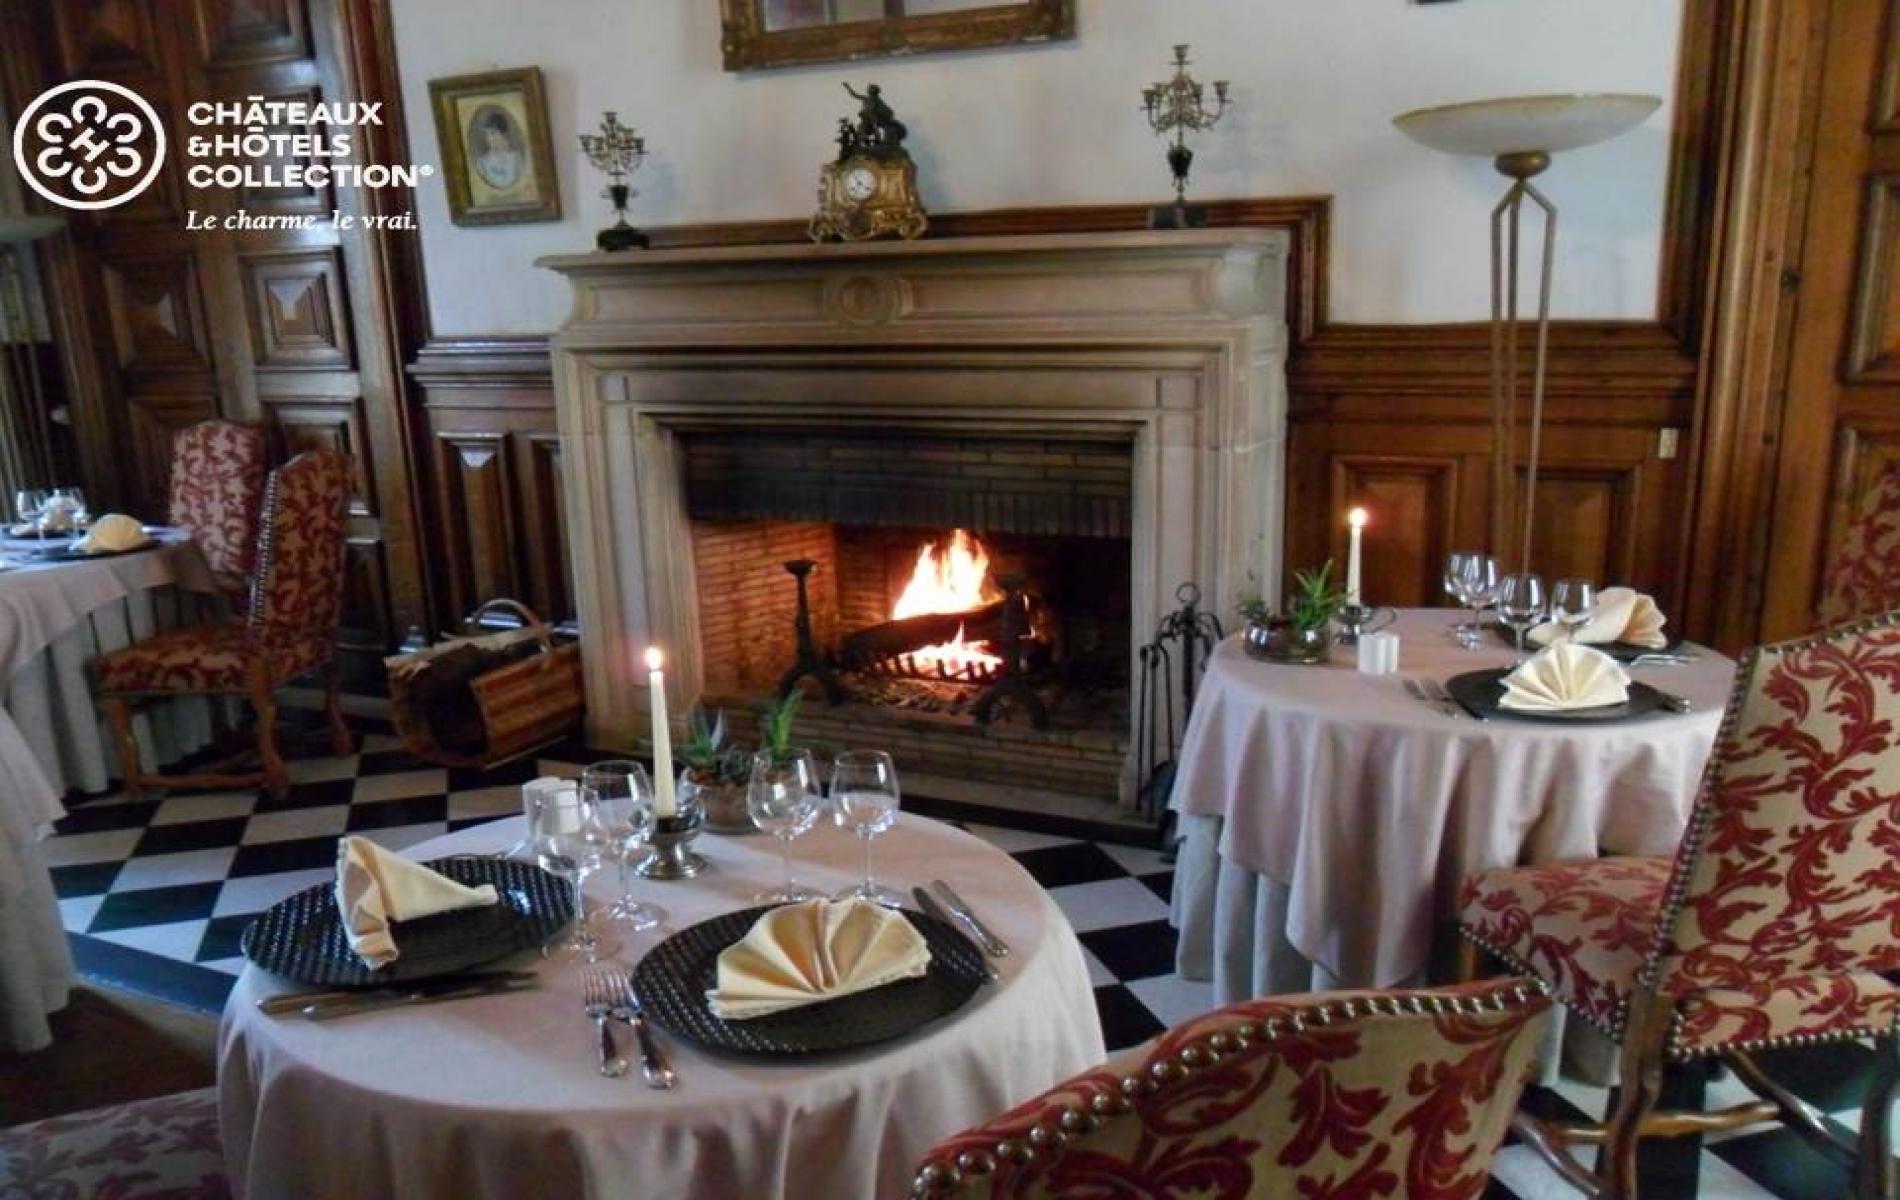 Gastronomie en Normandie proche d'Etretat